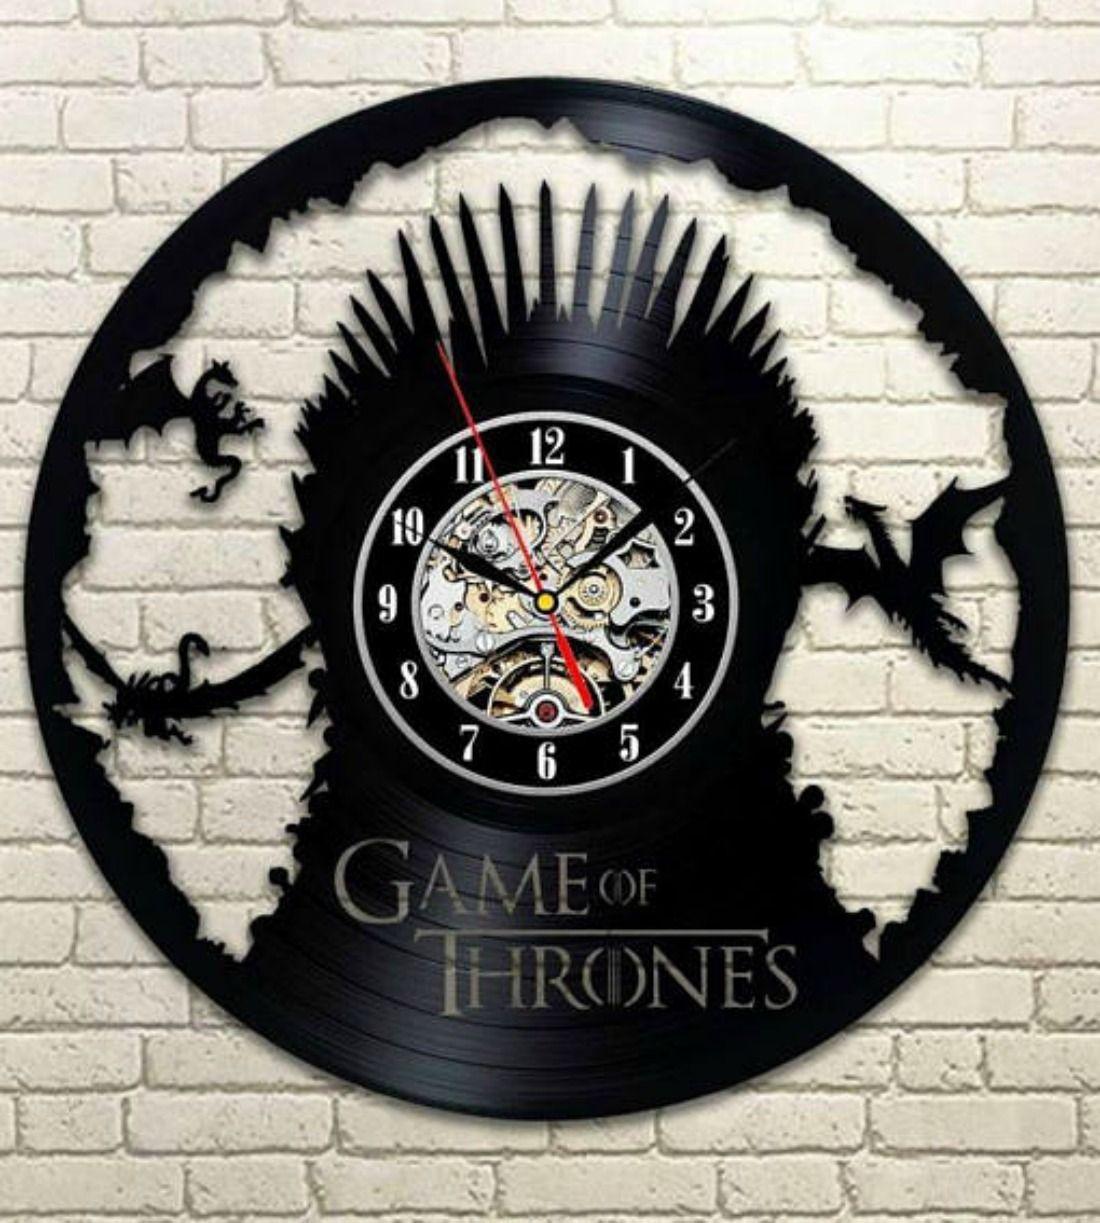 Game of Thrones clock, original wall clock made of vinyl